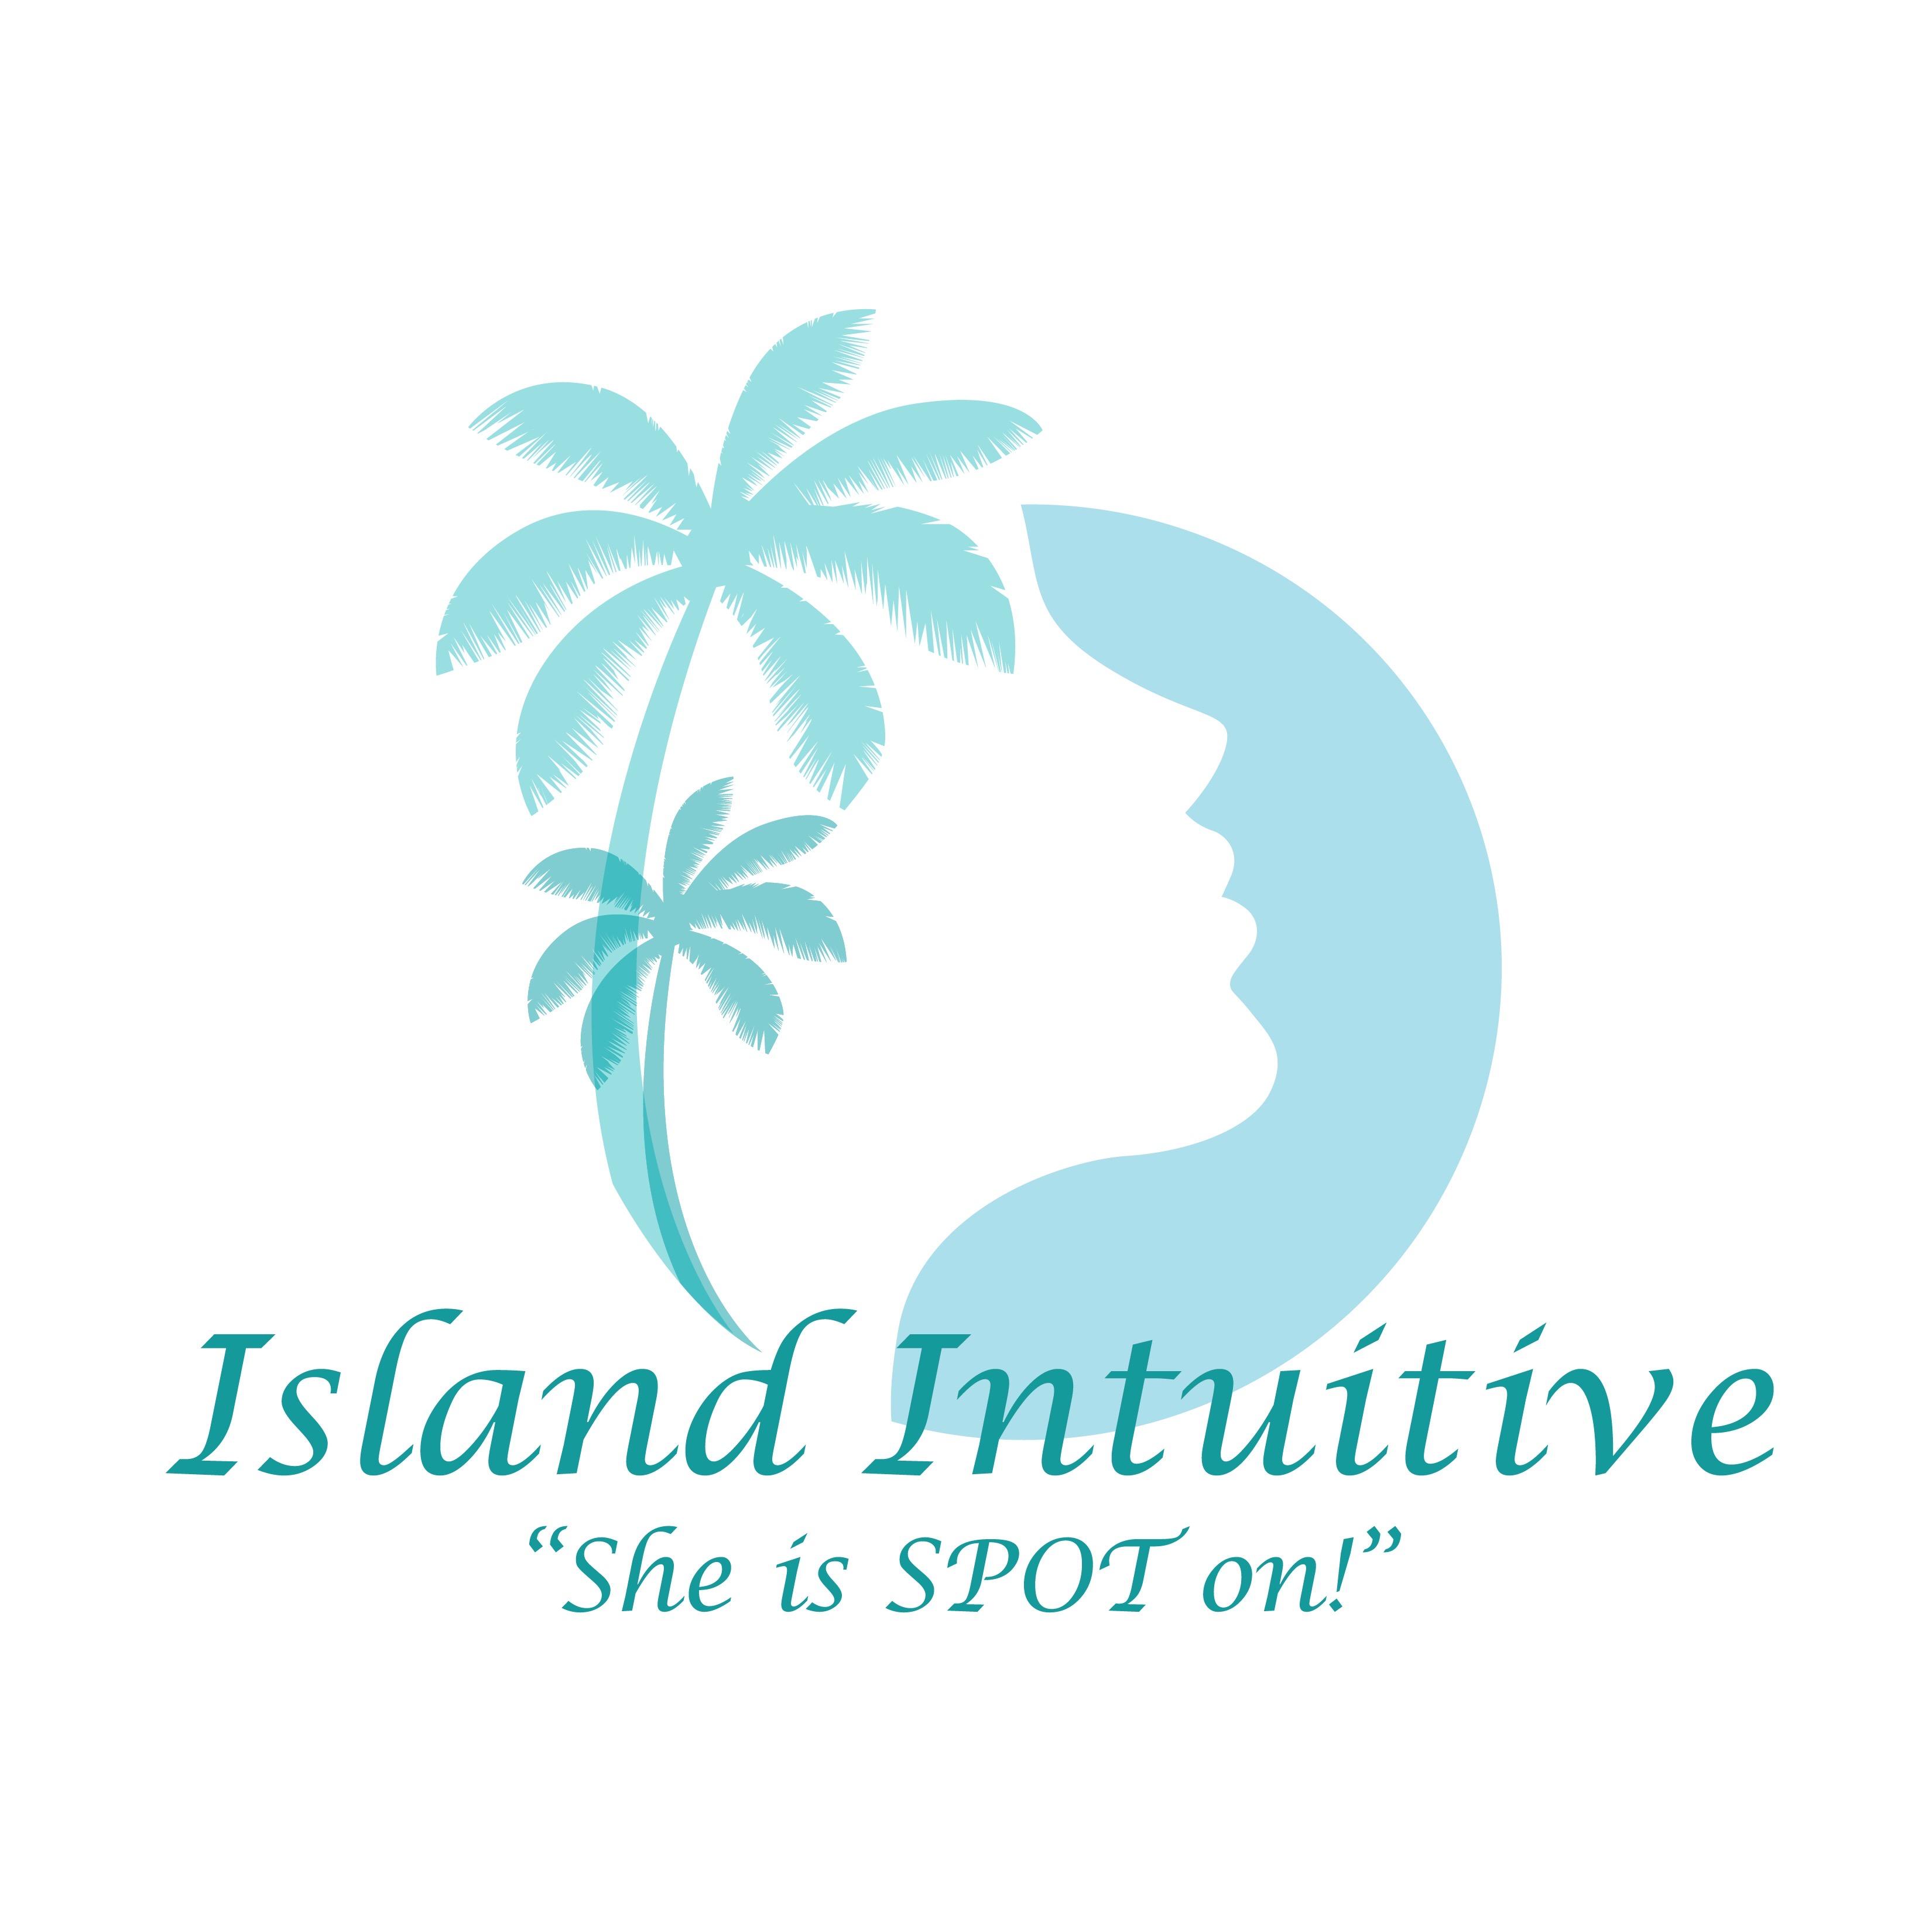 Island Intuitive